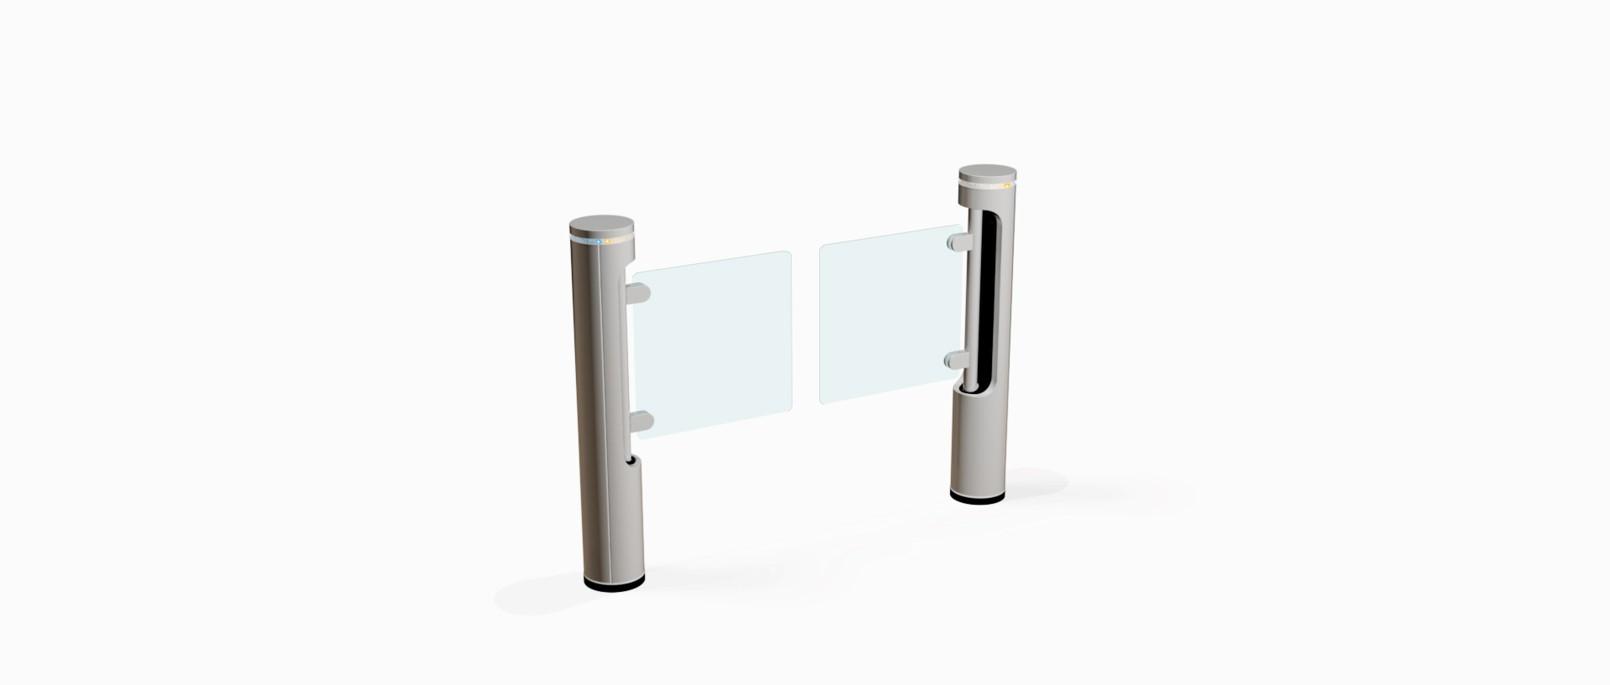 Fastlane Intelligate entrance control security turnstile